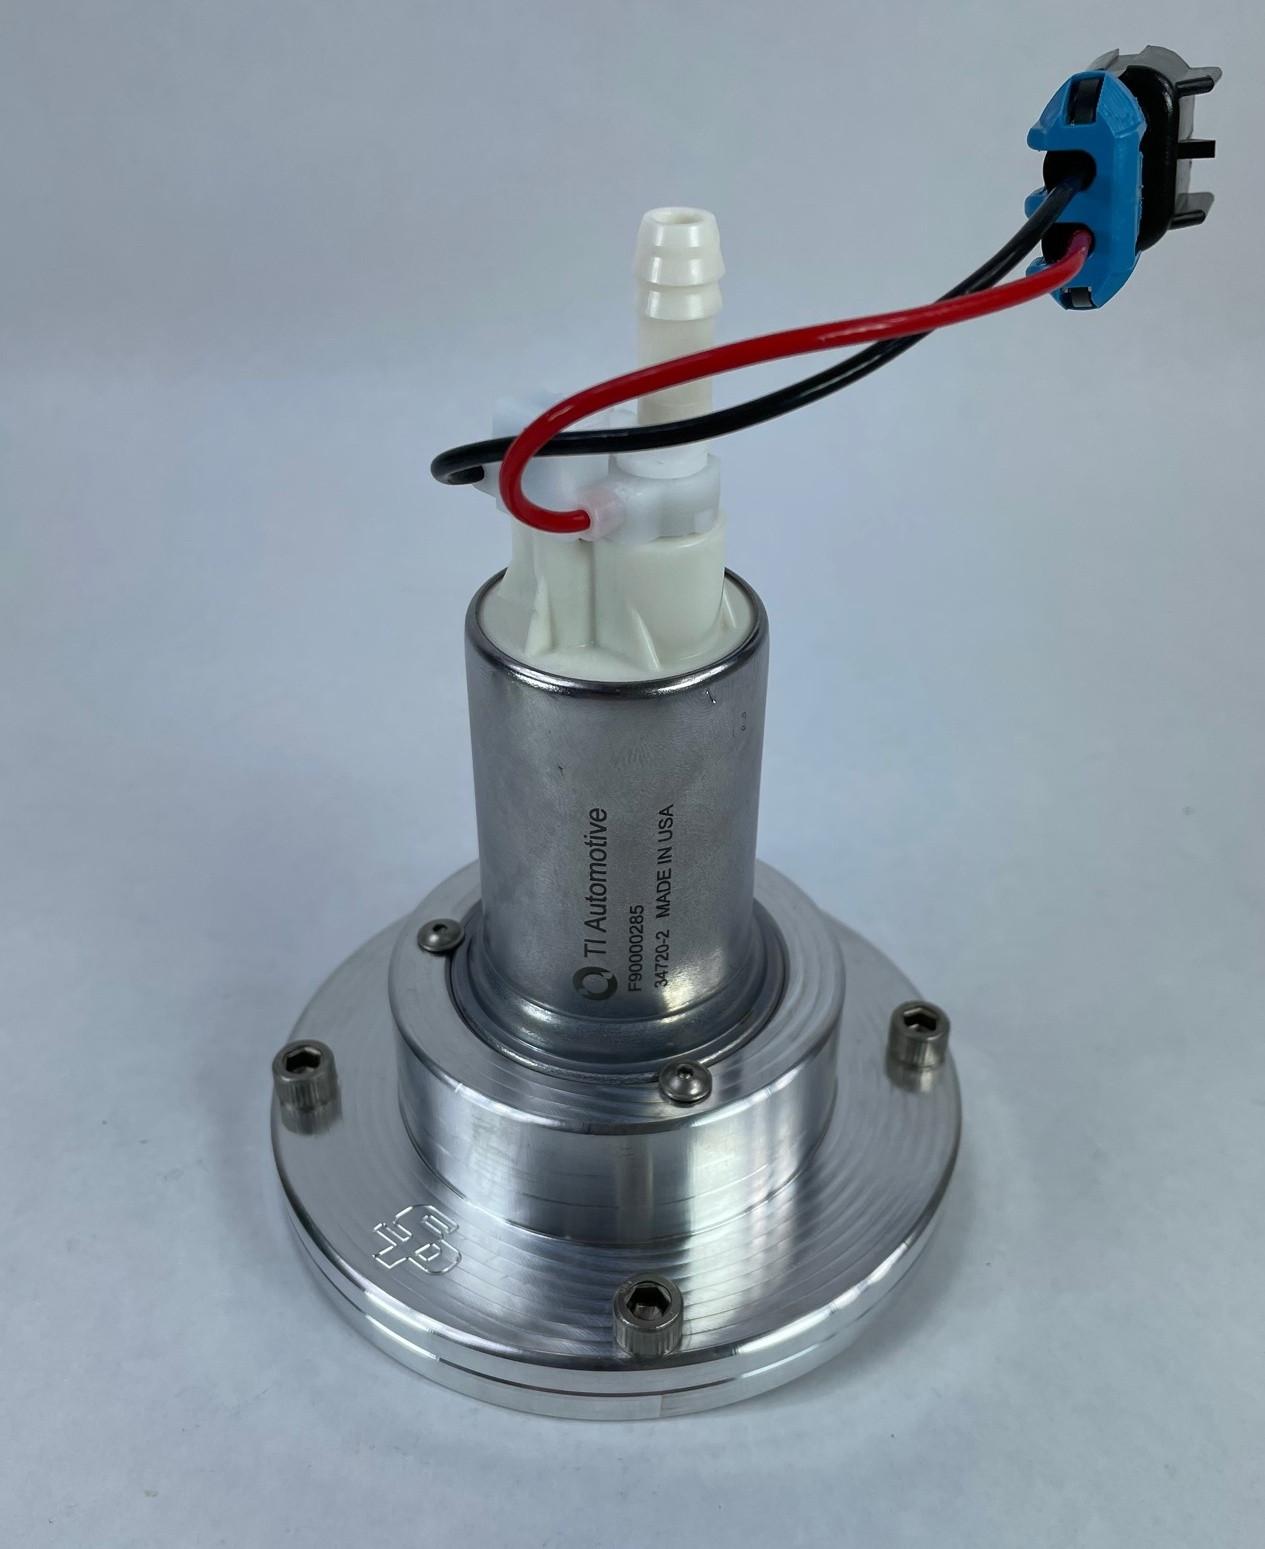 MK3 In-Tank Fuel Pump